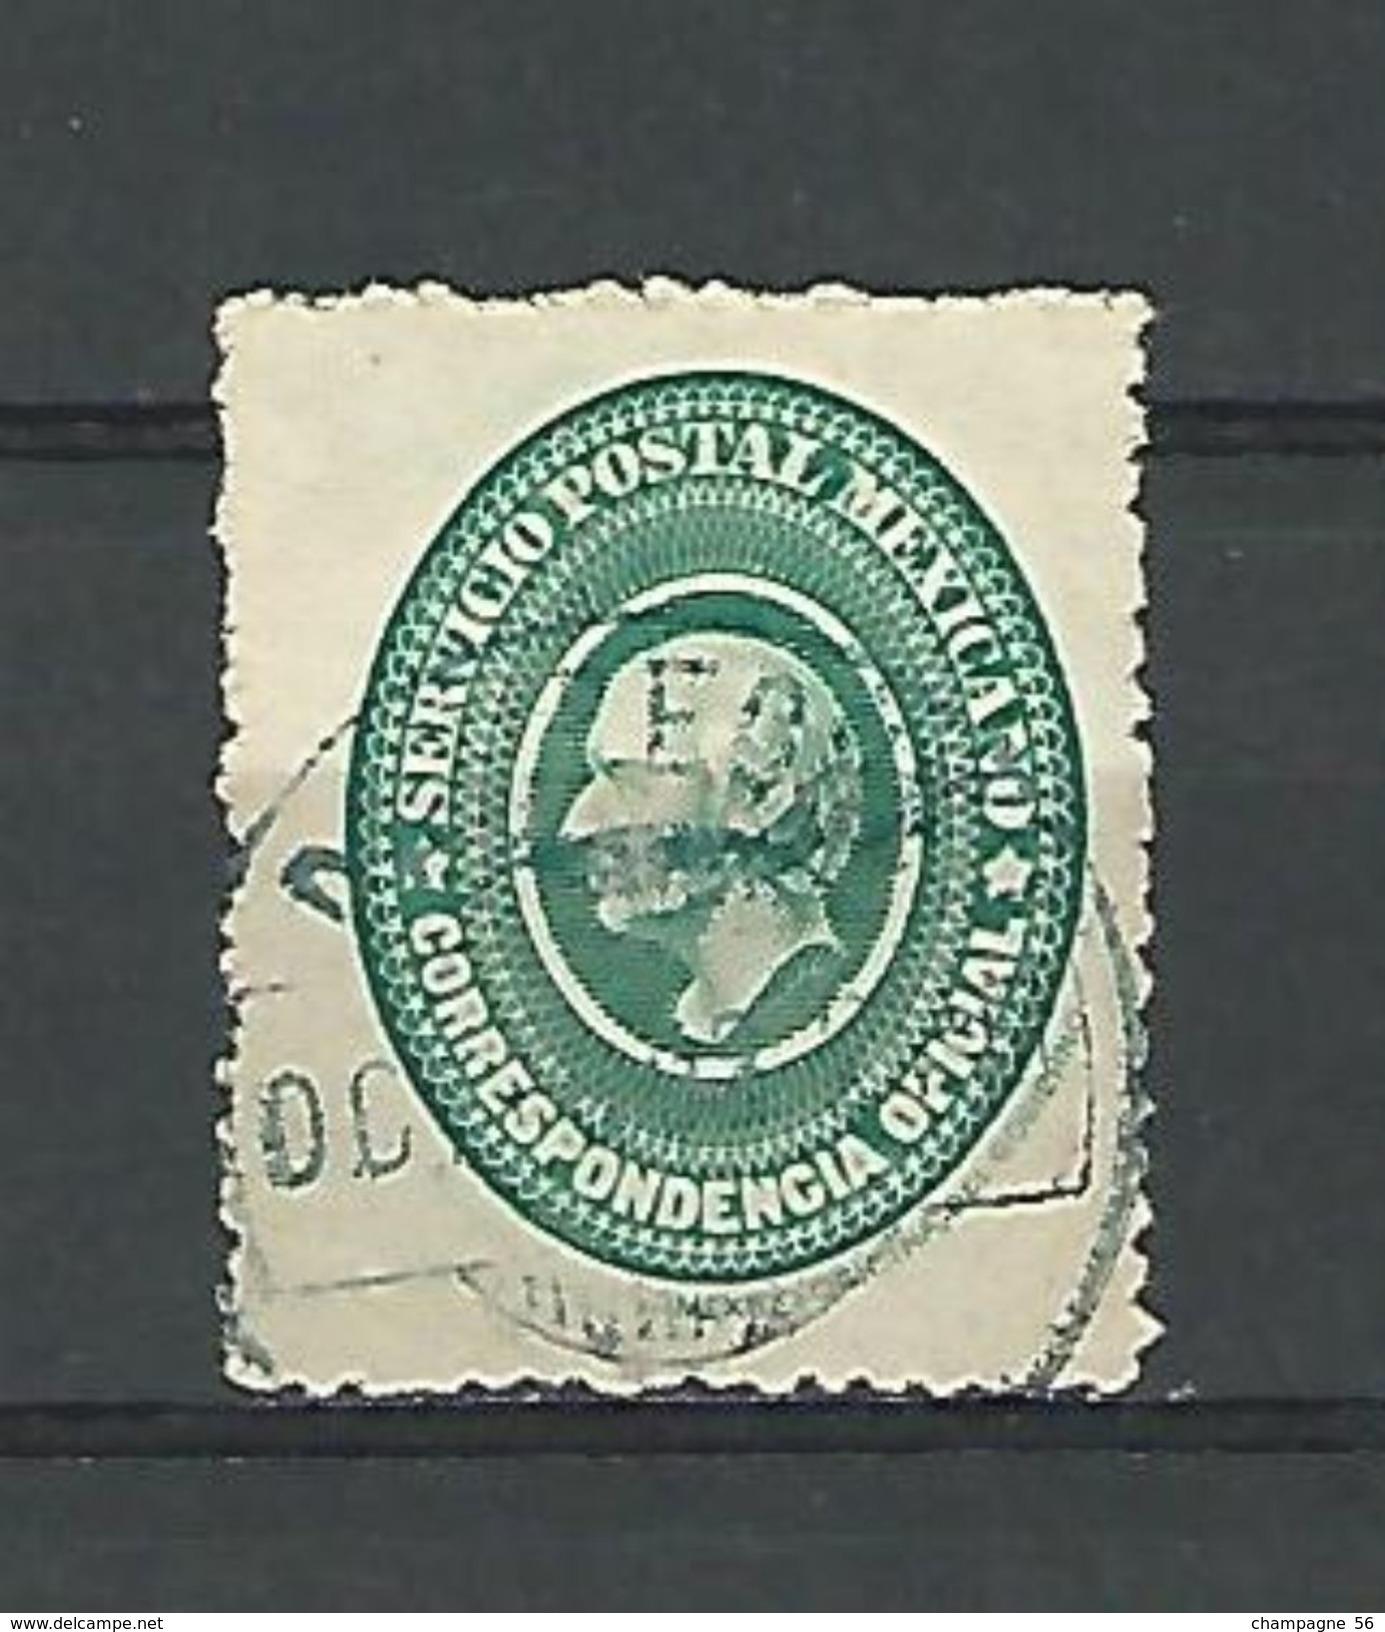 1884 N° 4 TIMBRES DE SERVICE MIGUEL HIDALGO VERT   CORRESPONDENCIA OFICIAL  OBLITÉRÉ DOS CHARNIÈRE - Mexico